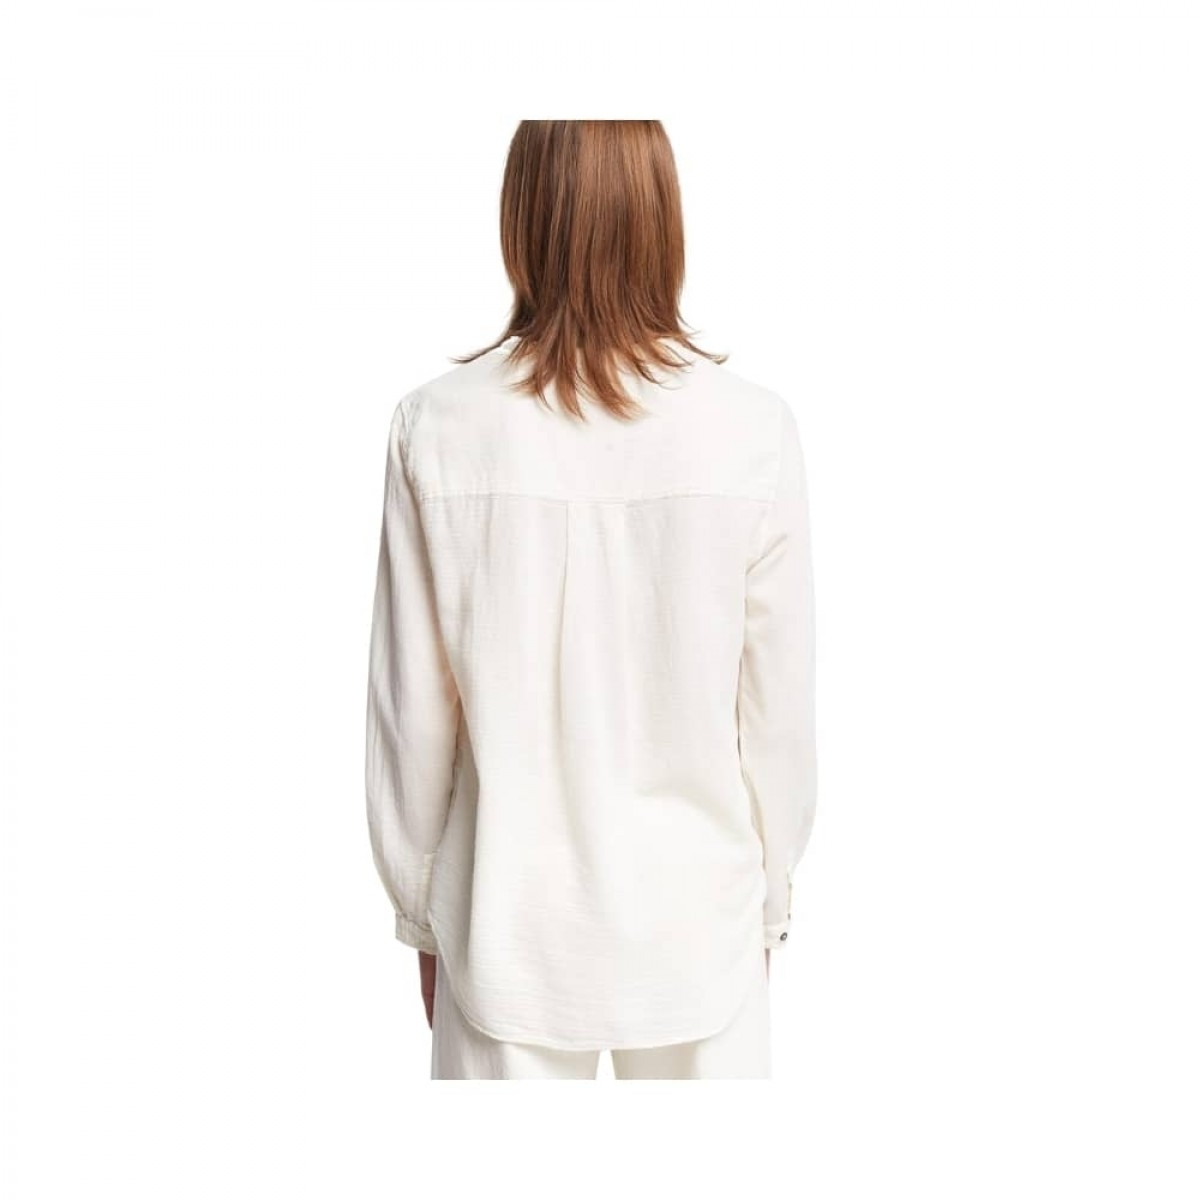 ensfarvet skjorte pomandére - ecru - model ryg